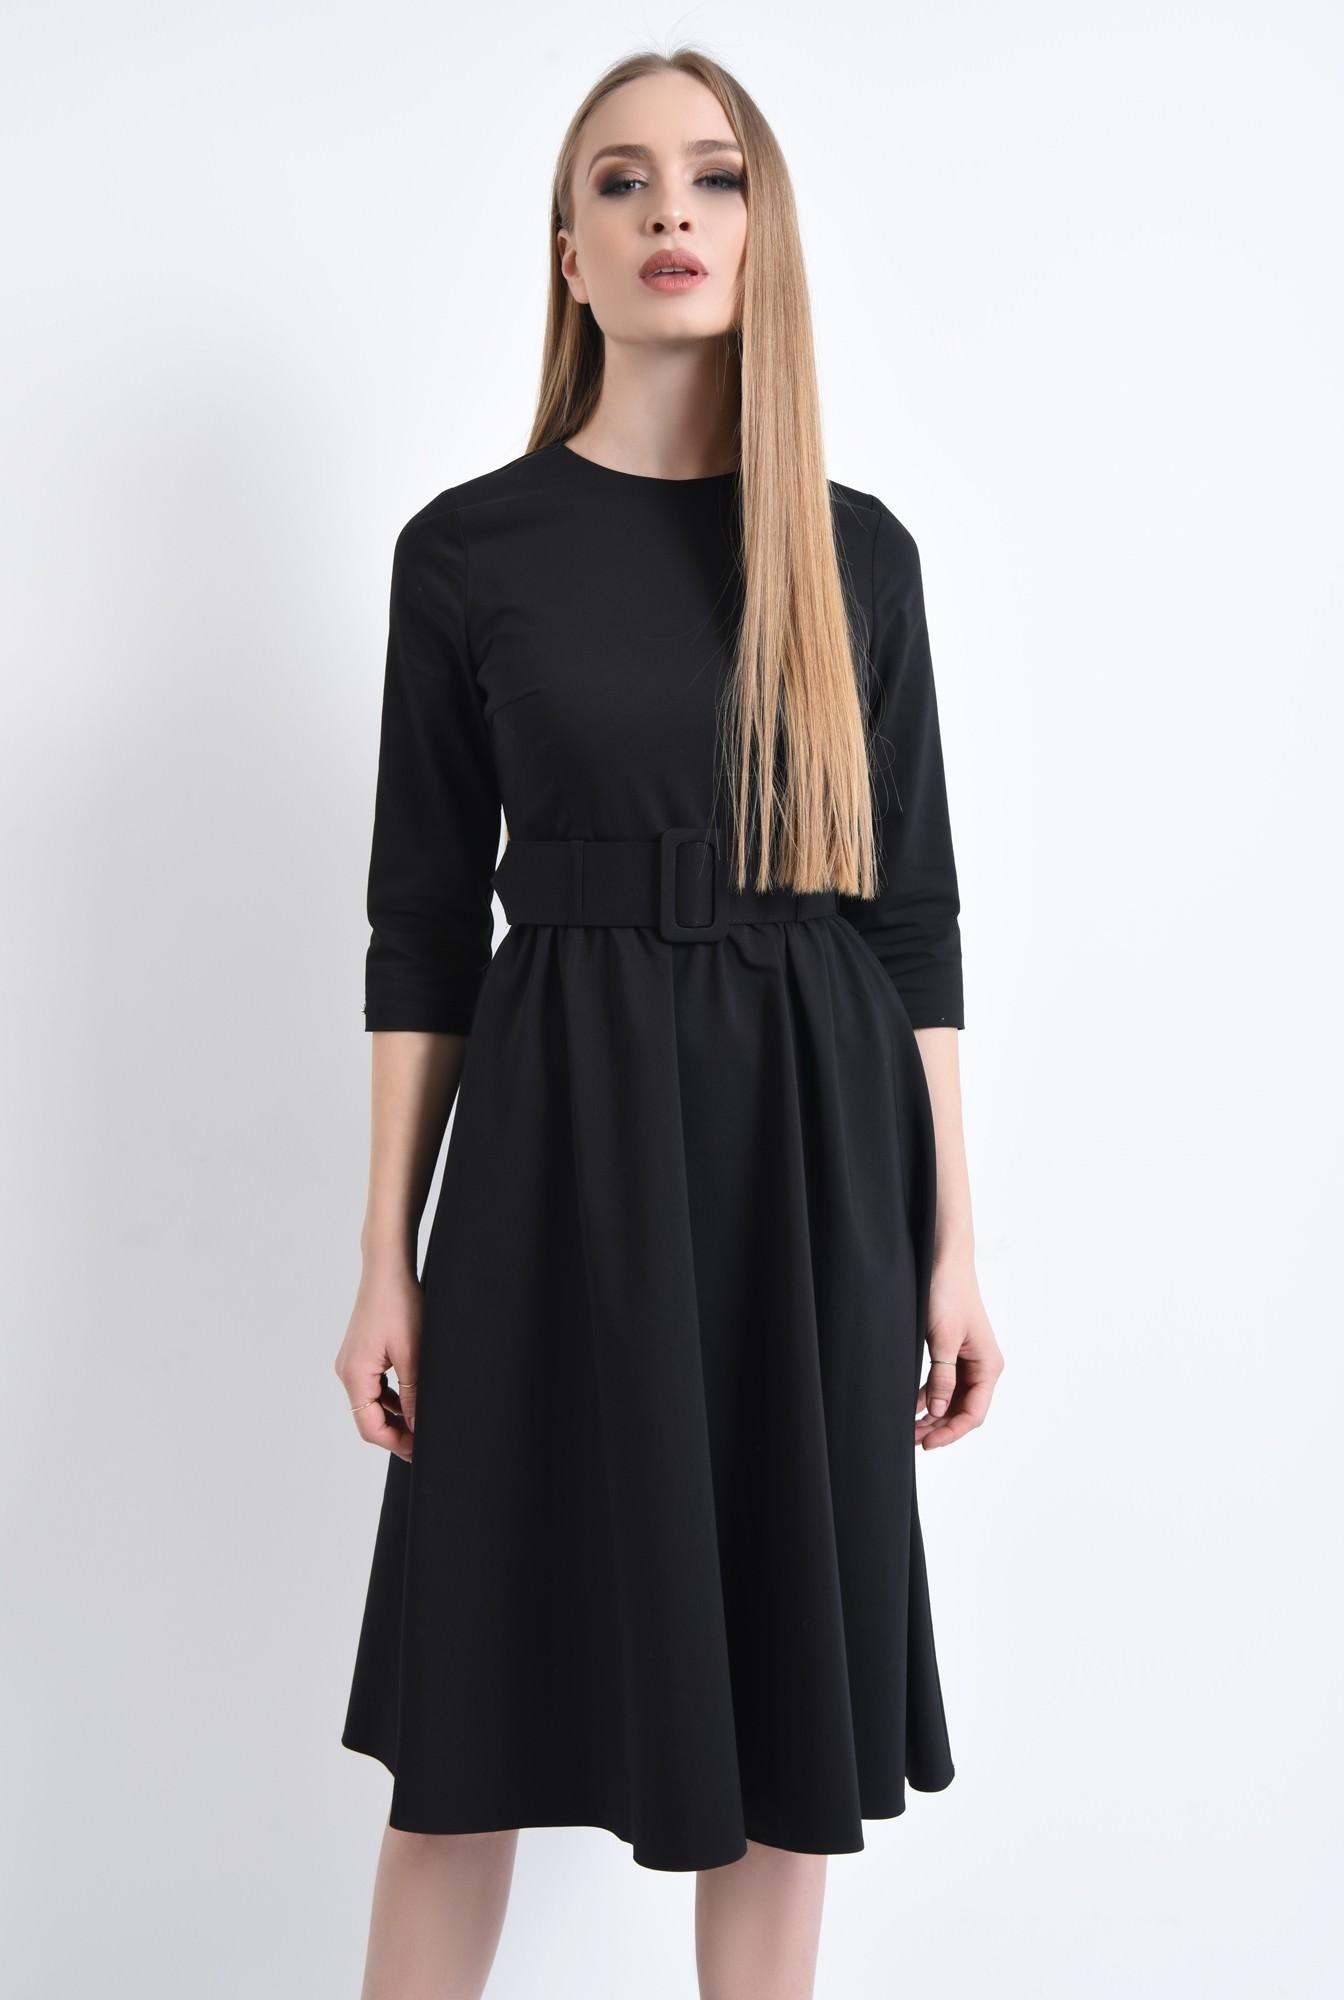 0 - 360 - Rochie casual, centura material textil